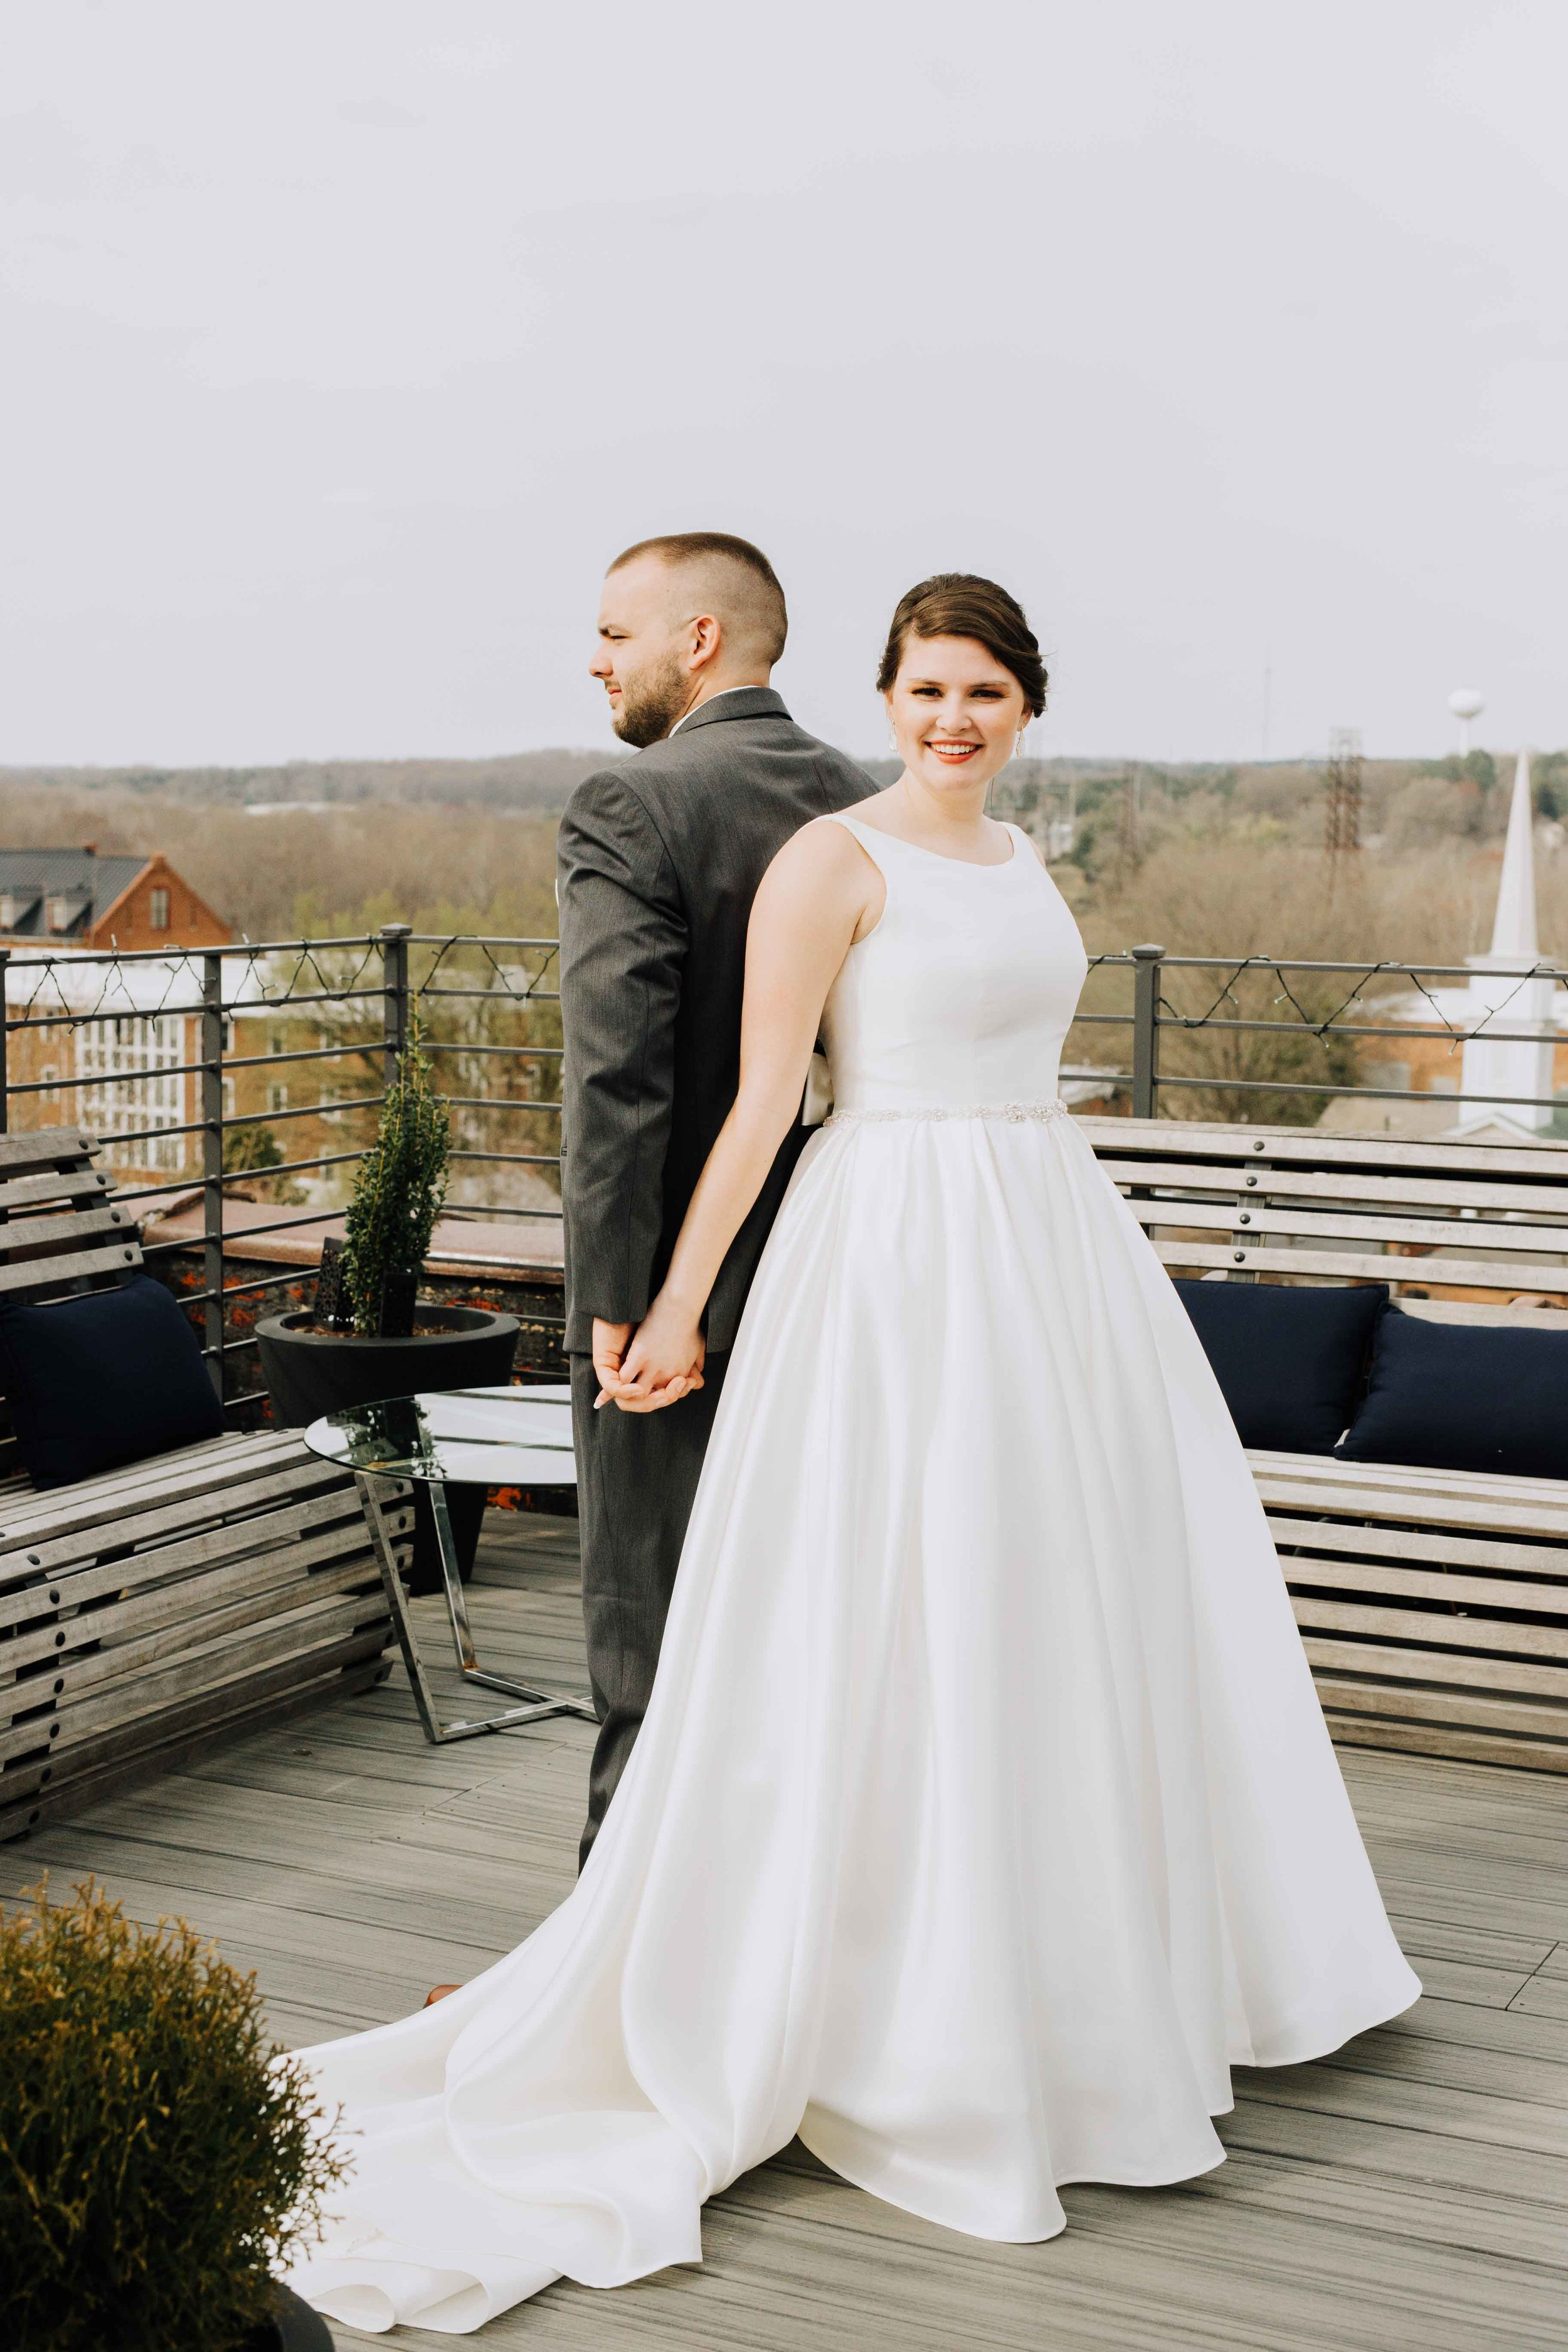 Farmville-Virginia-Wedding-Hotel-Weynoke-Downtown-Jacqueline-Waters-Photography-Detailed- (500).jpg